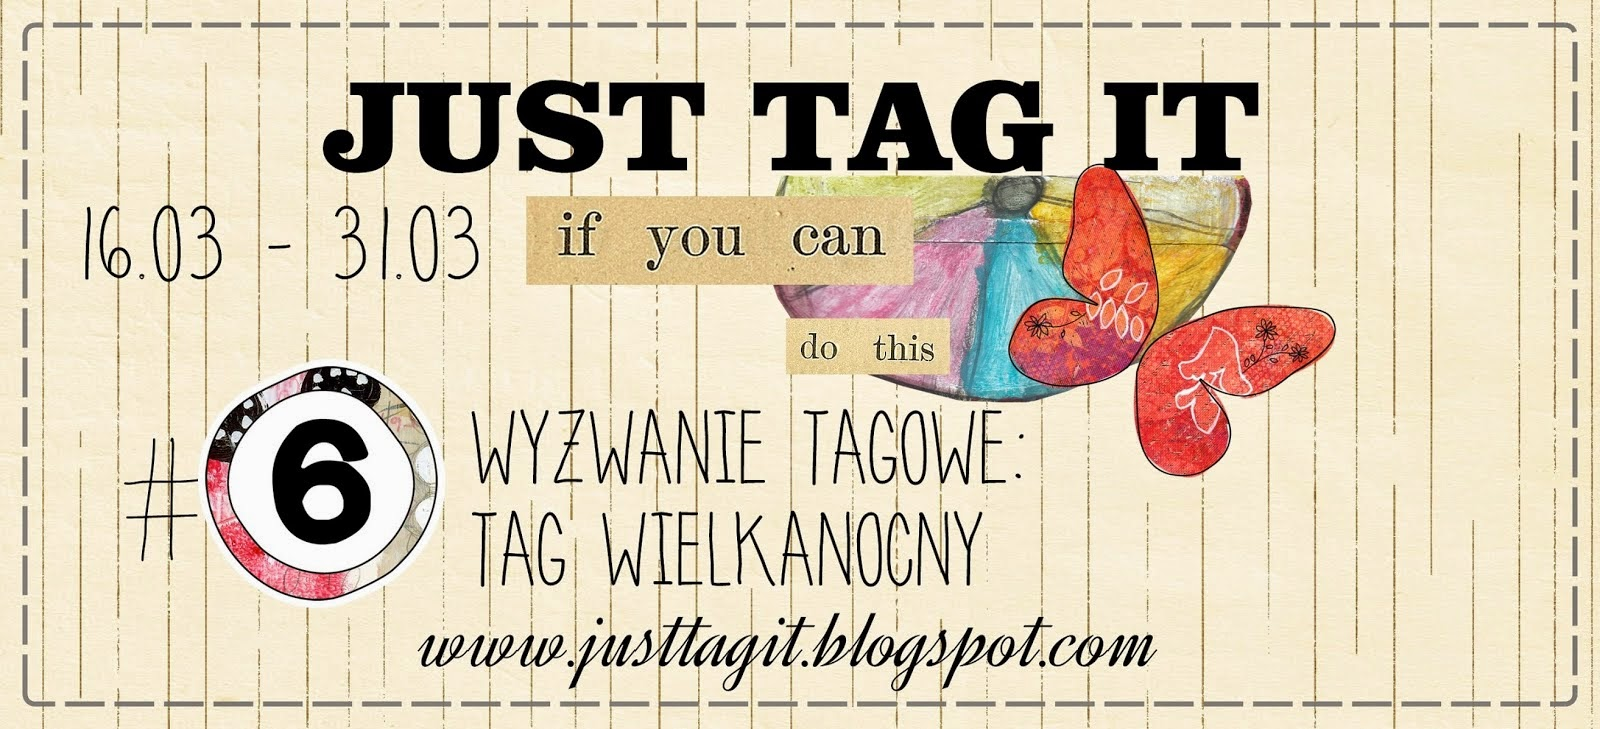 http://justtagit.blogspot.com/2015/03/6-wyzwanie-tagowe-wielkanoc.html